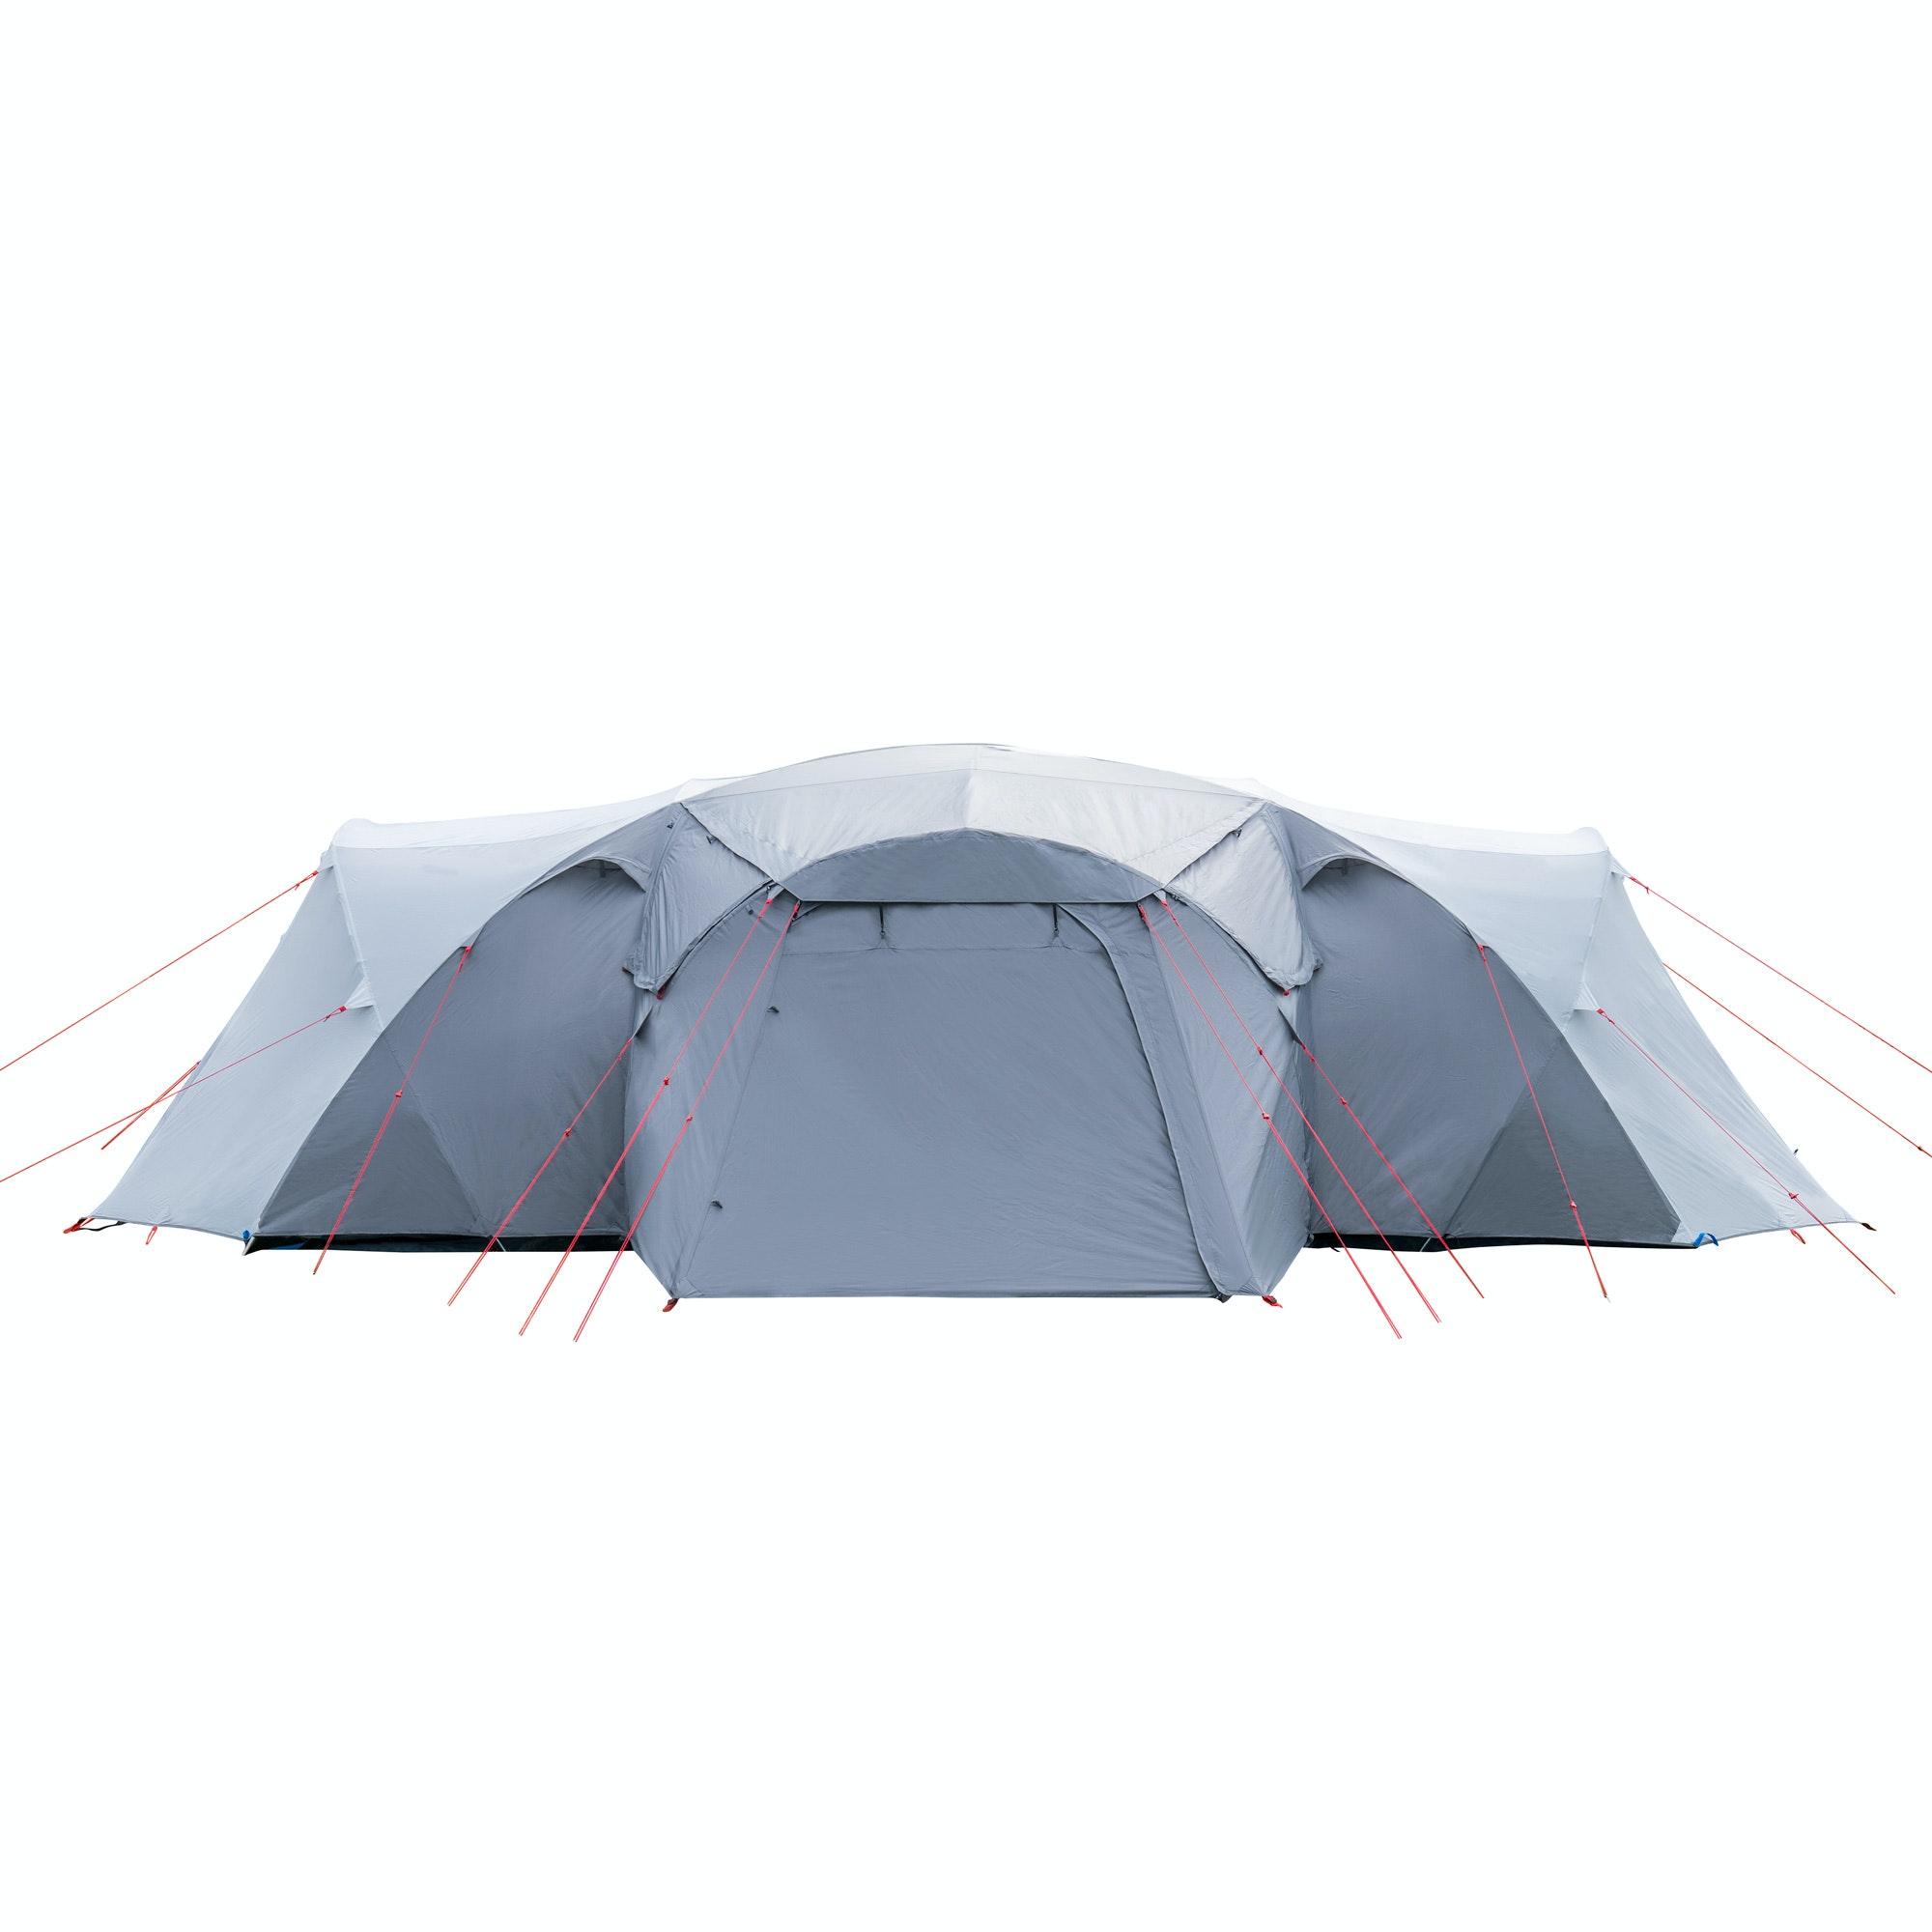 H41  sc 1 st  Kathmandu & Retreat 360 7 Person Module Tent - Warm Grey/Sunset